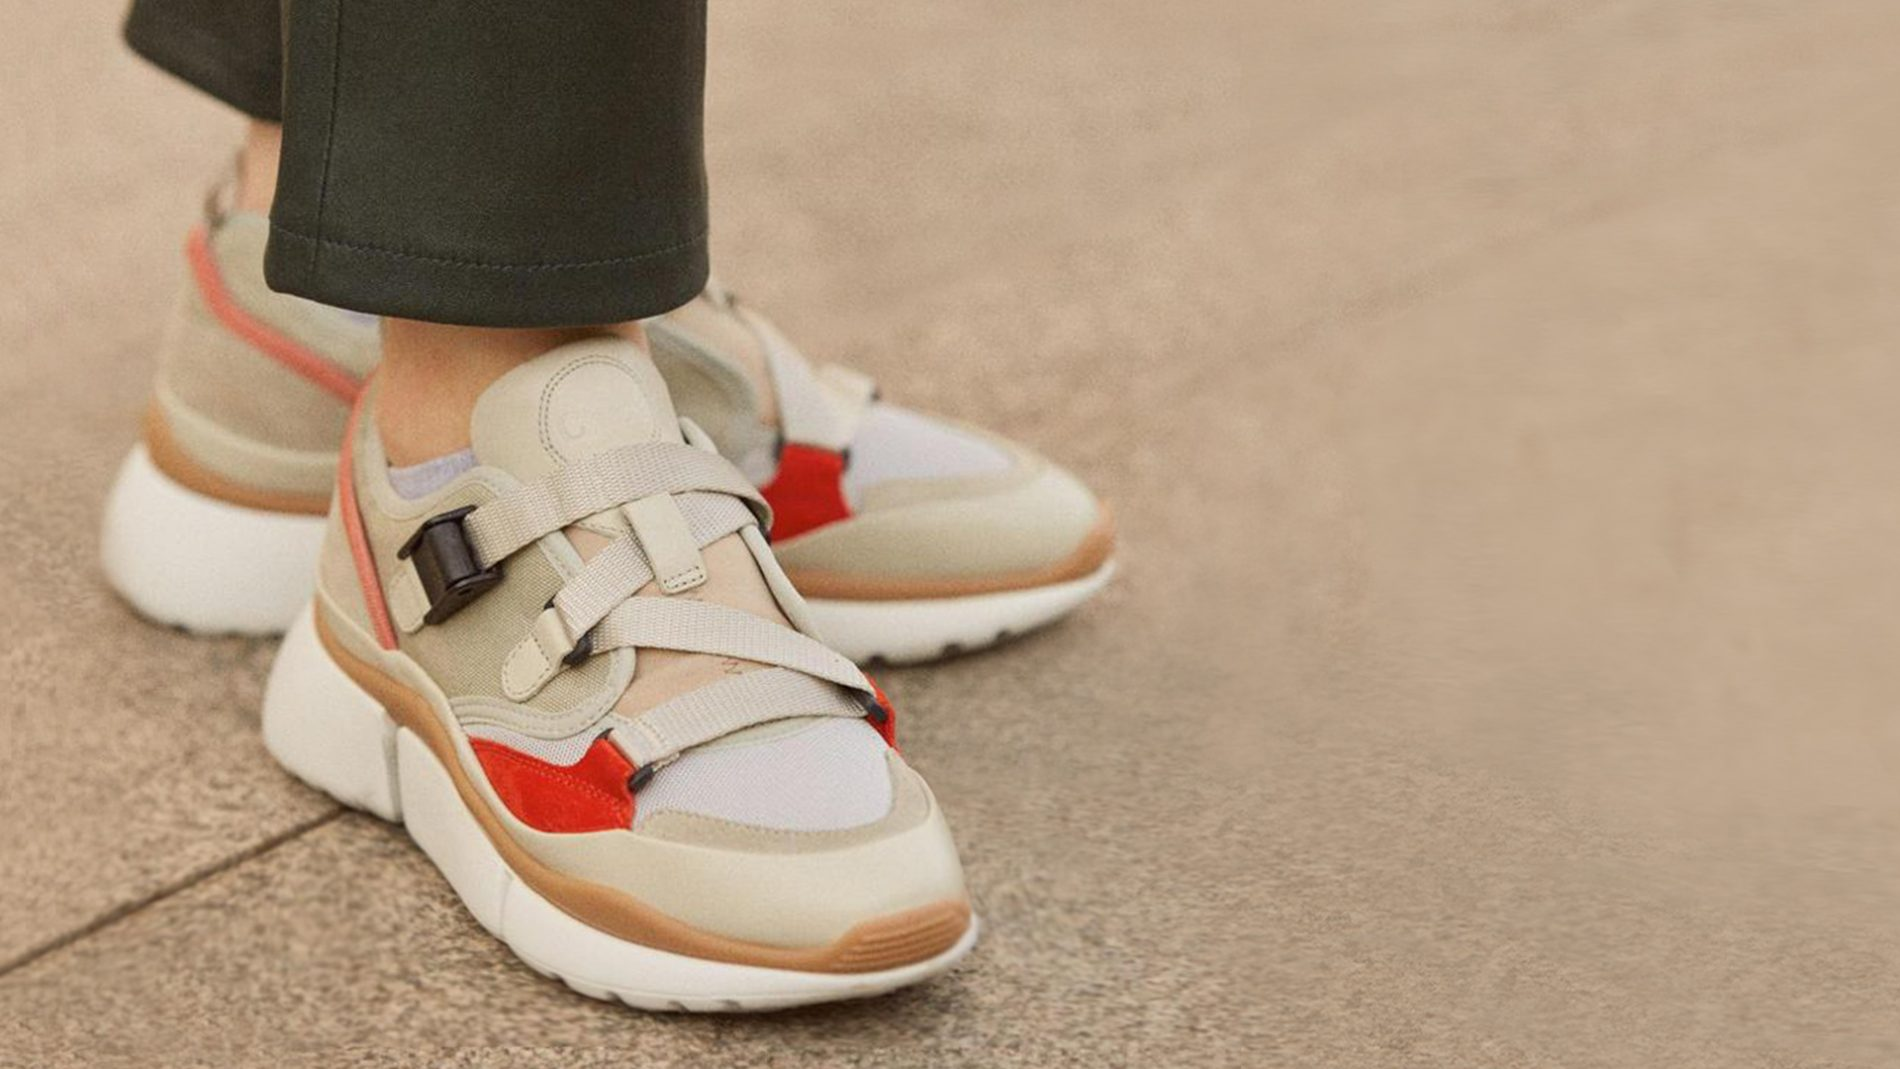 El Corte Inglés Designer Accessories Shoes Handbags Jewelry Chloé